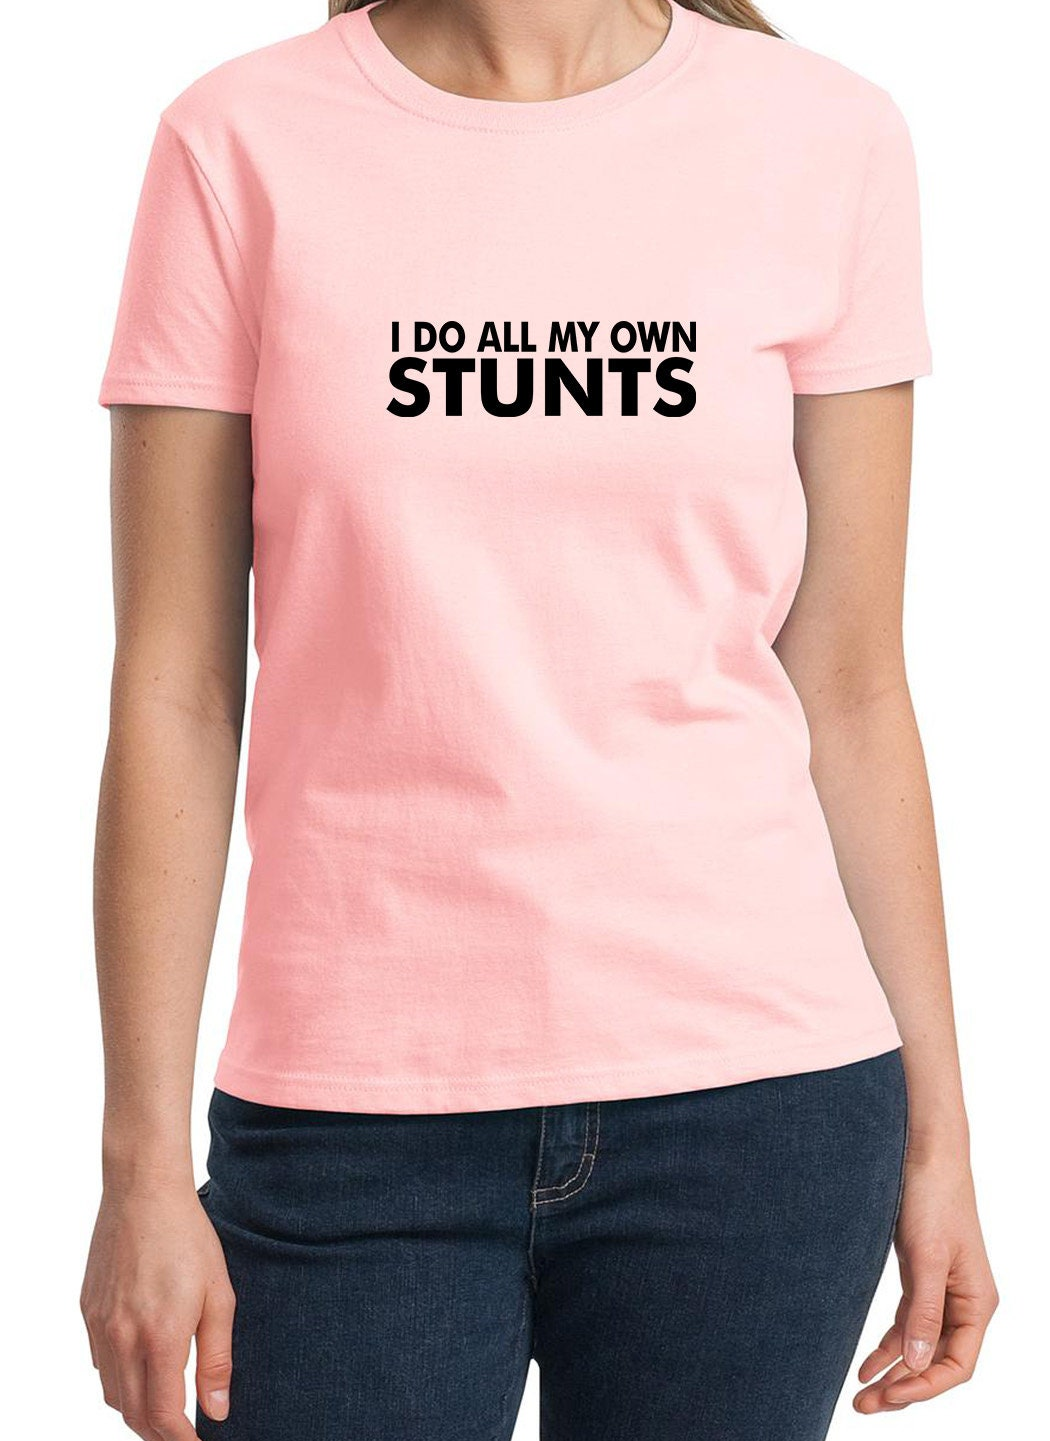 T-Shirt KNBC Graphics I Do All My Own Stunts